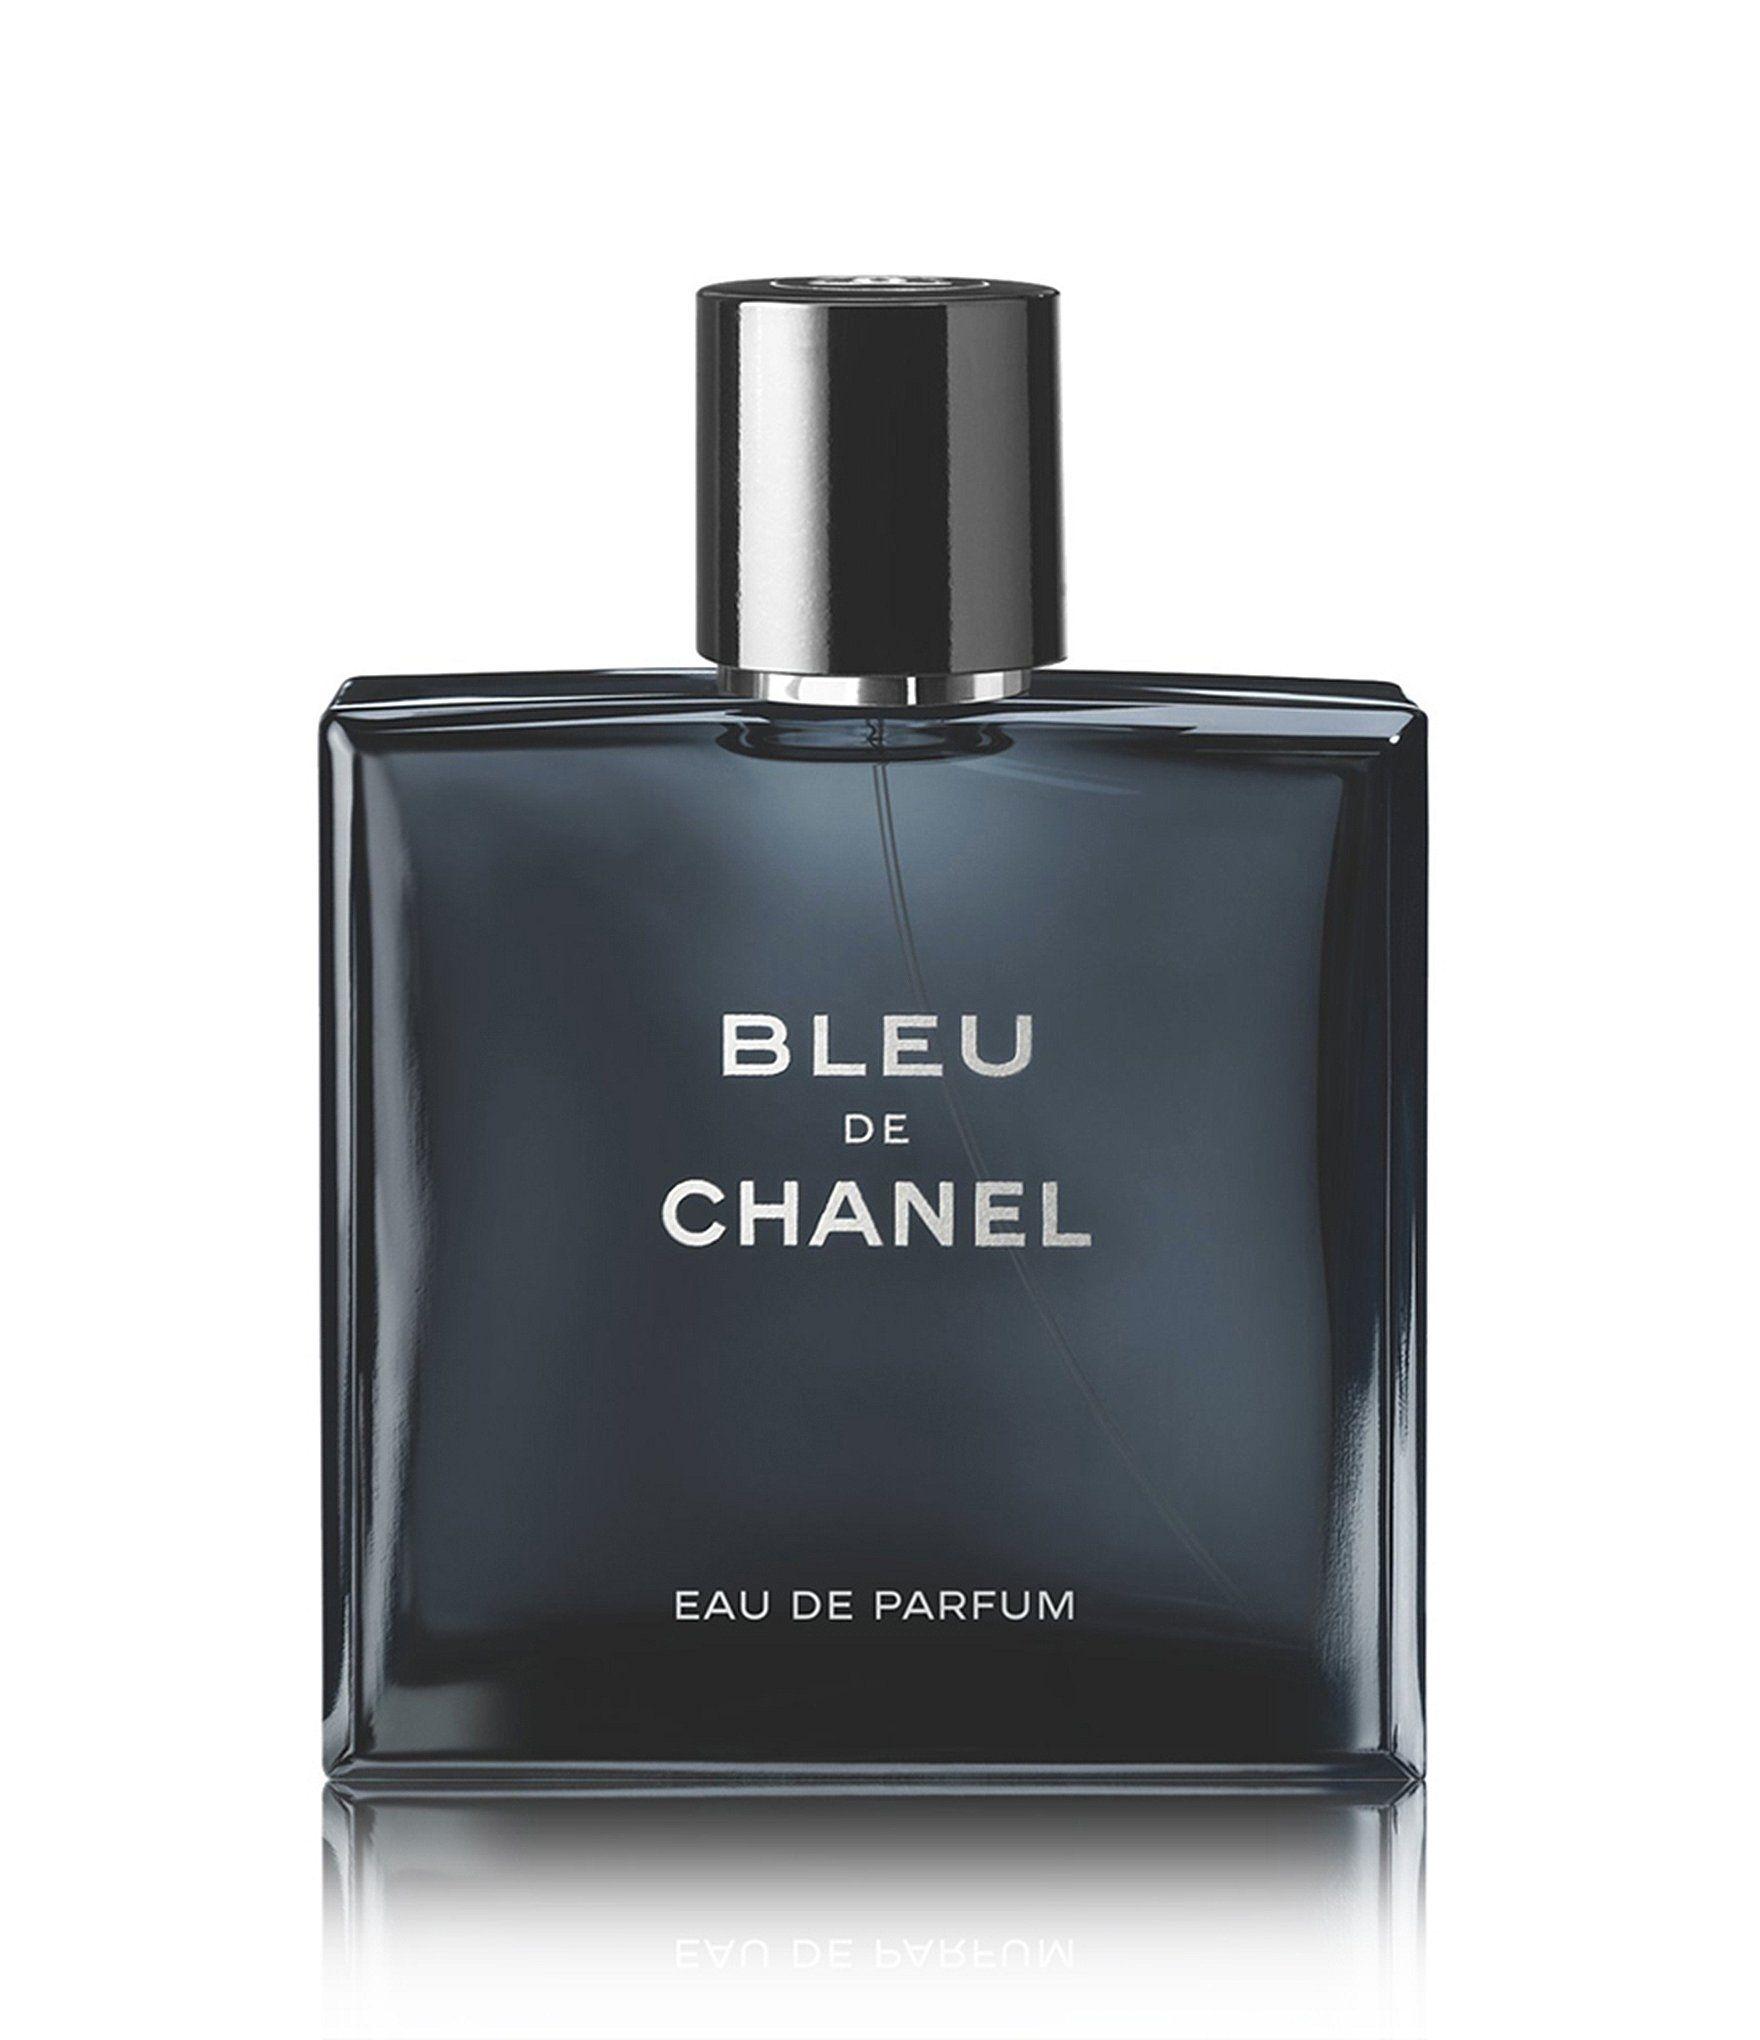 chanel blue herrparfym